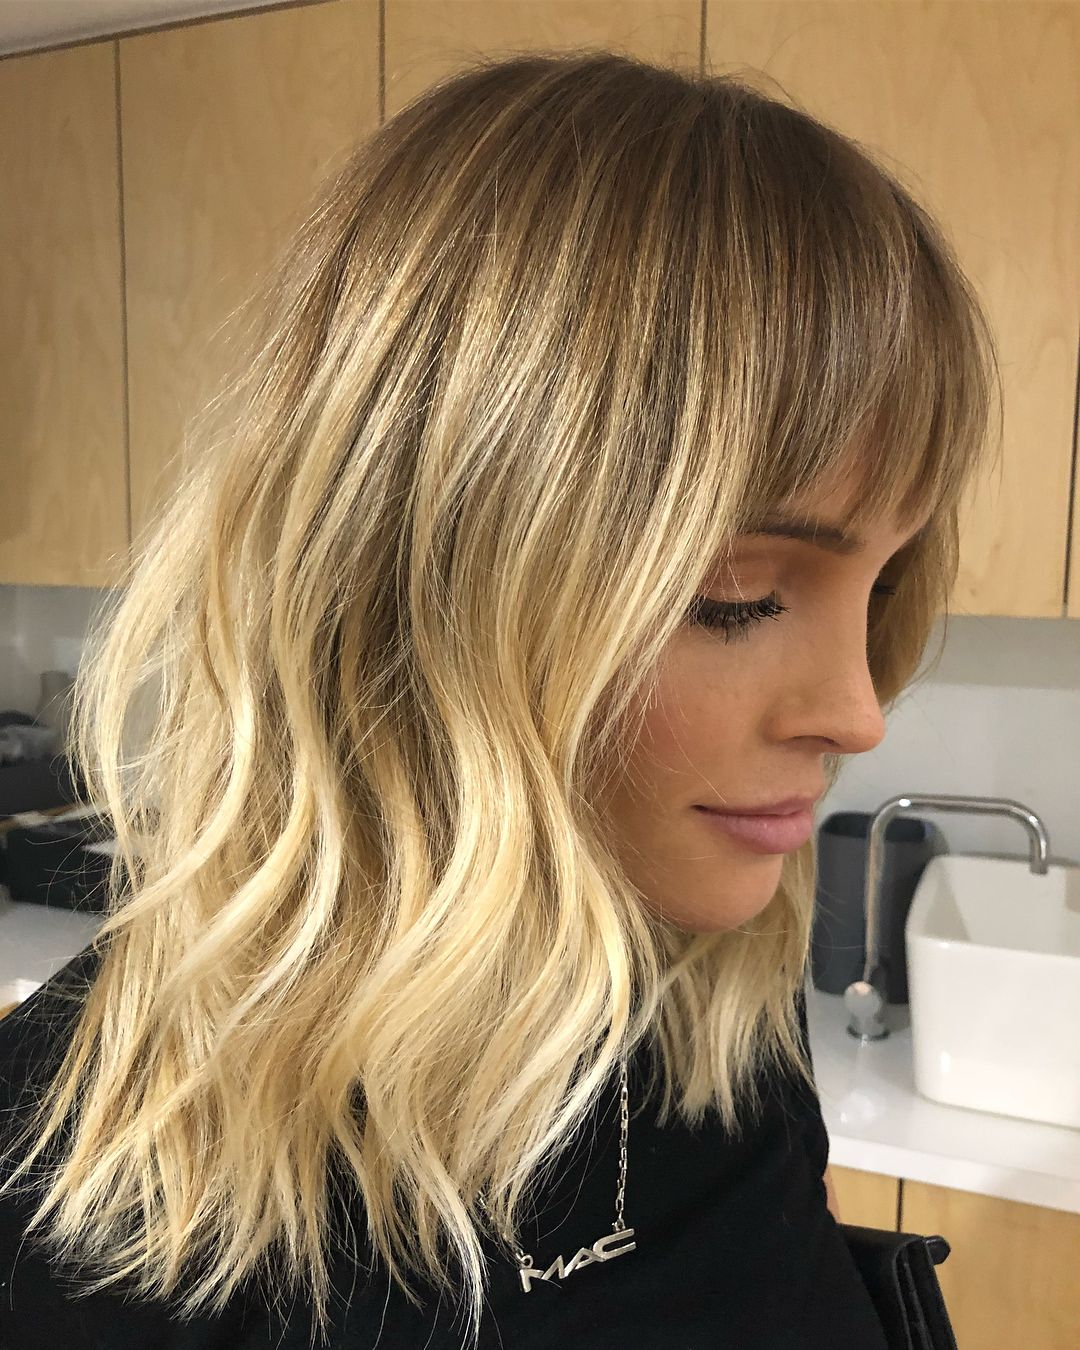 Yesterday S Balayage Haircut Magic On Melaniejanemua The